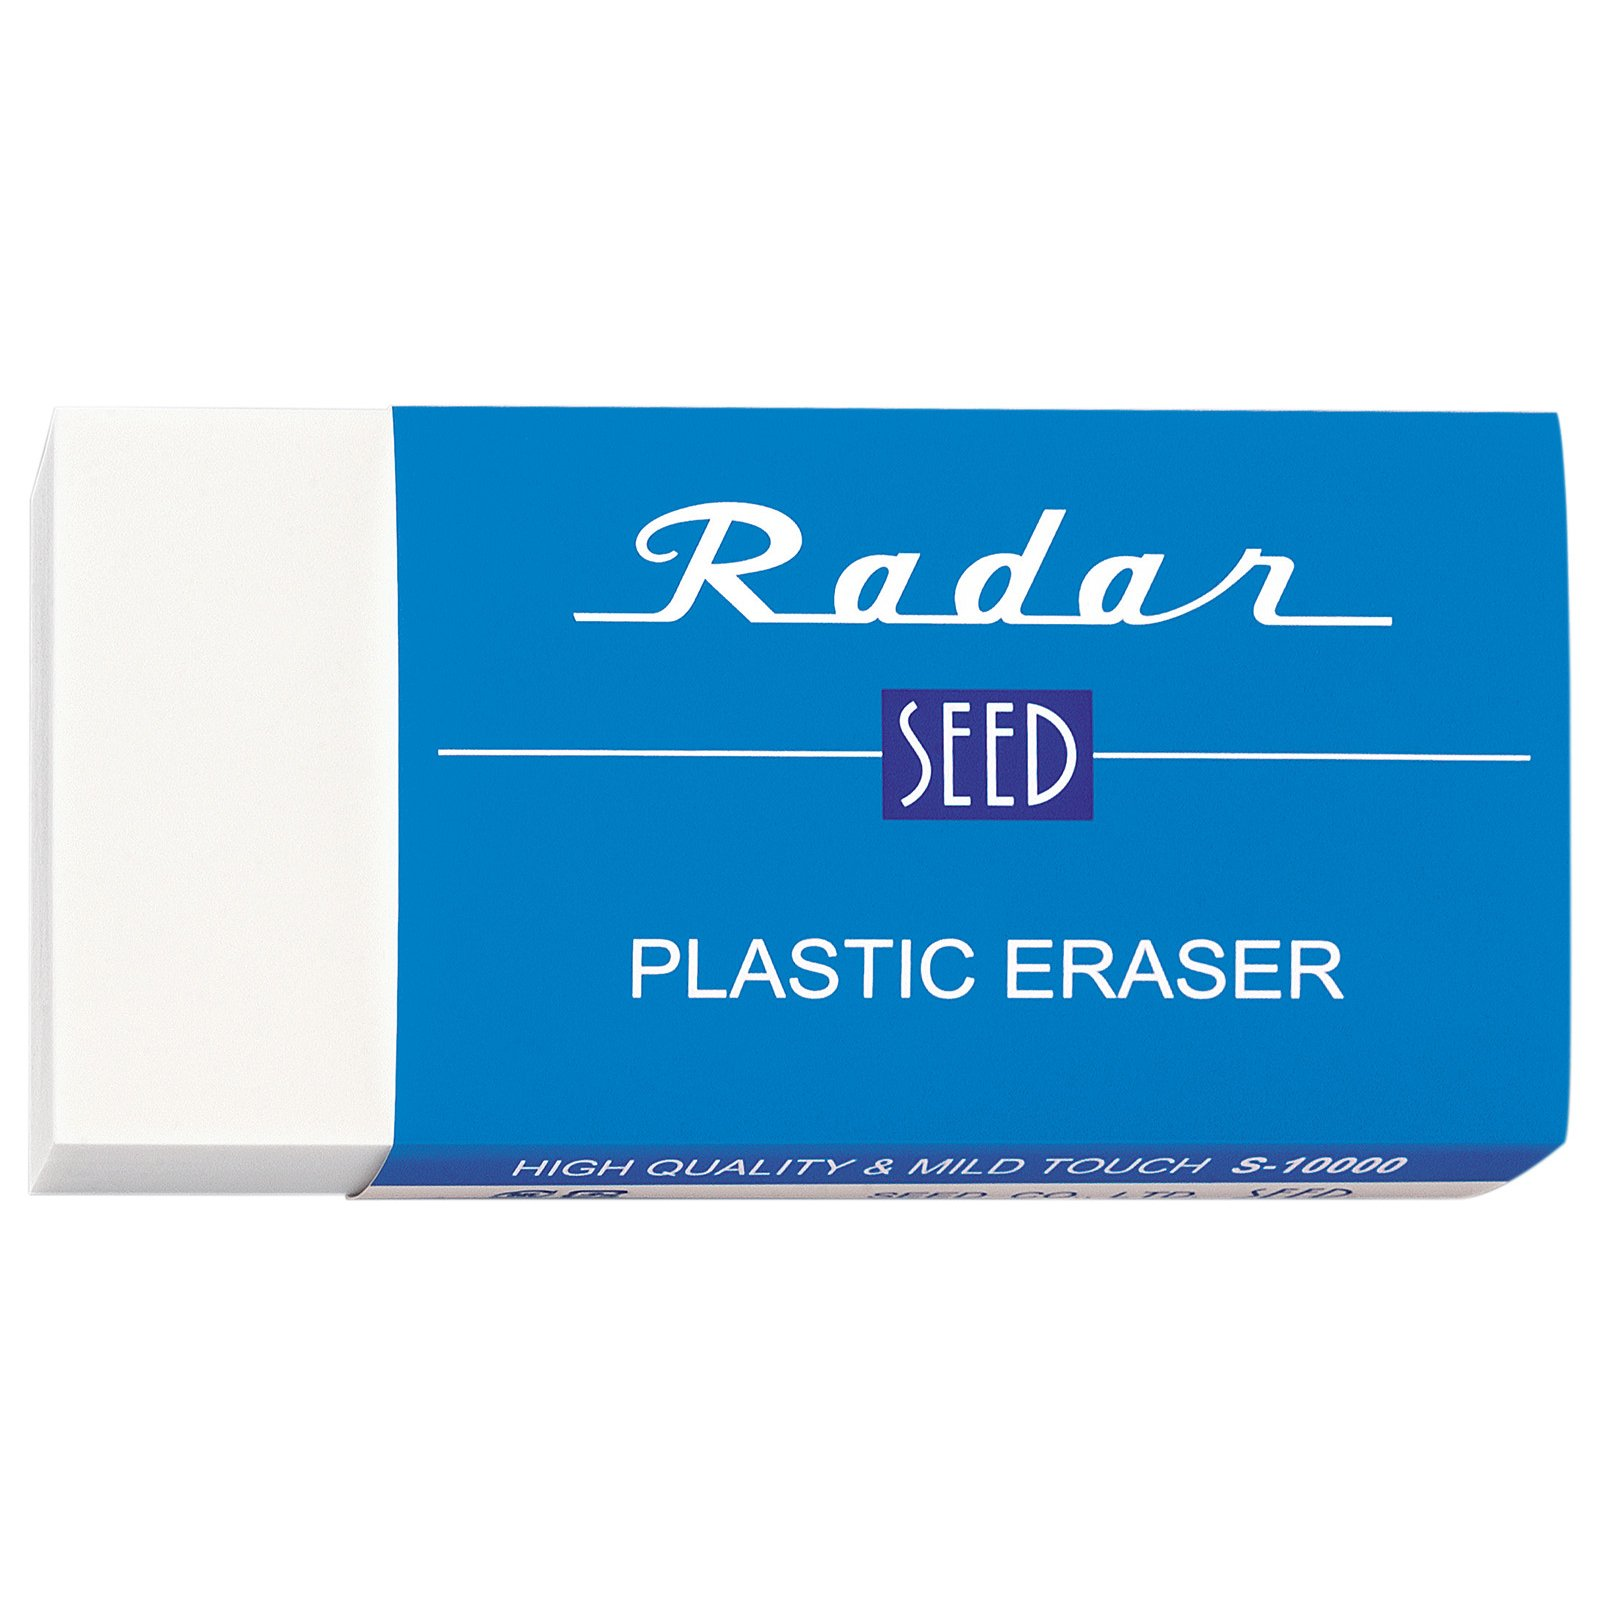 Super Big Size Eraser''Radar S-10000'' by SEED